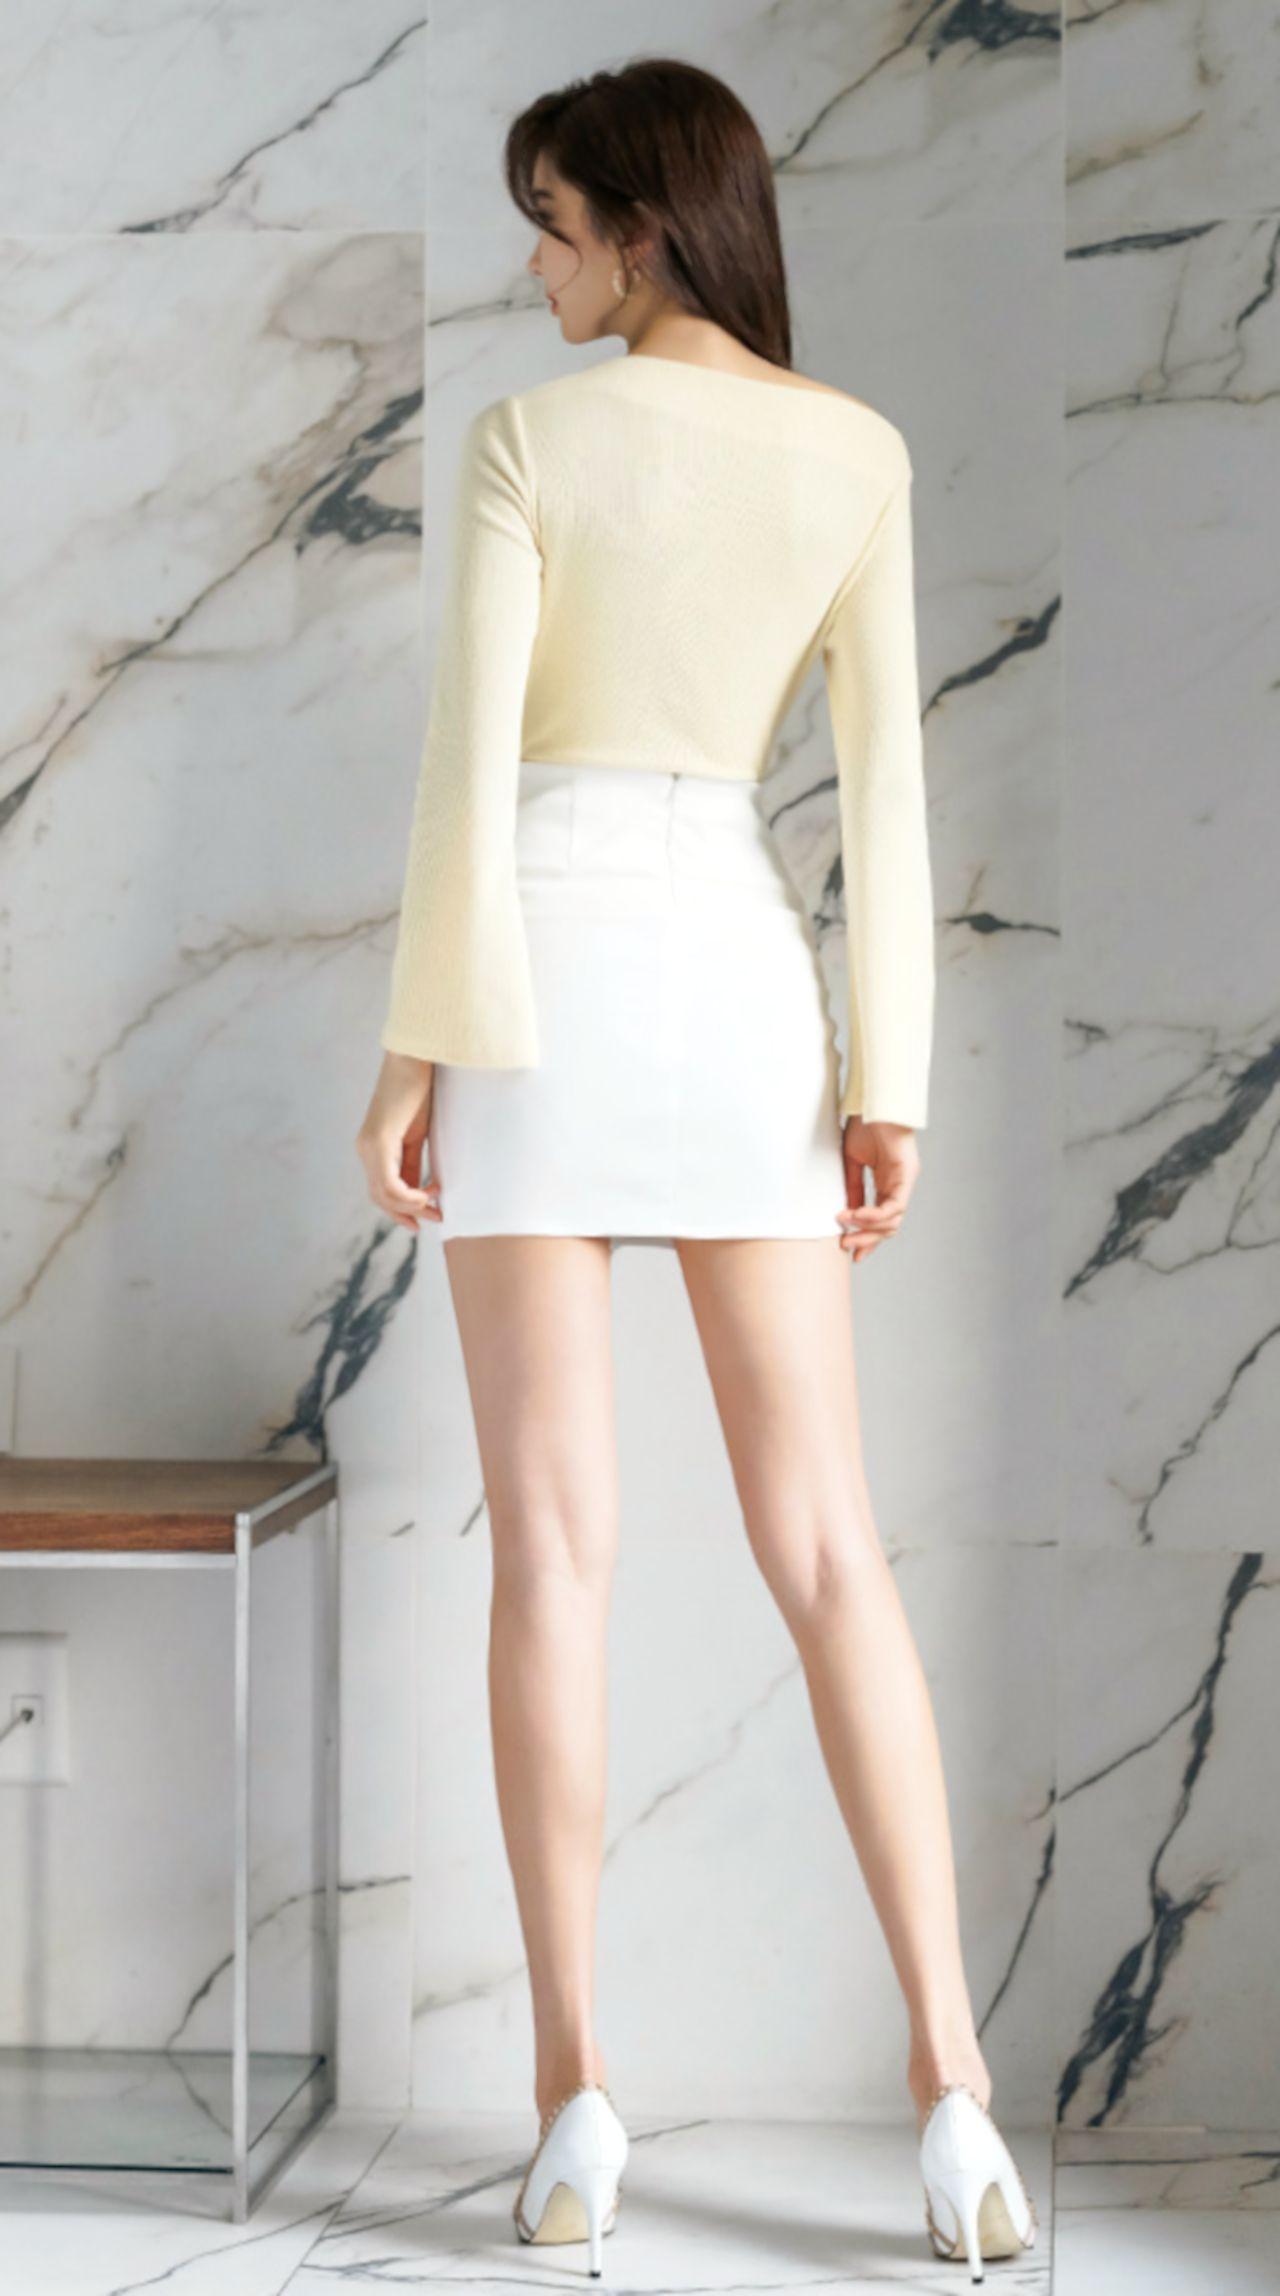 soumy1902kmod: 박수연 (朴秀妍 - ParkSooYeon) 코코엠 9403 (1/2) | 패션 스타일